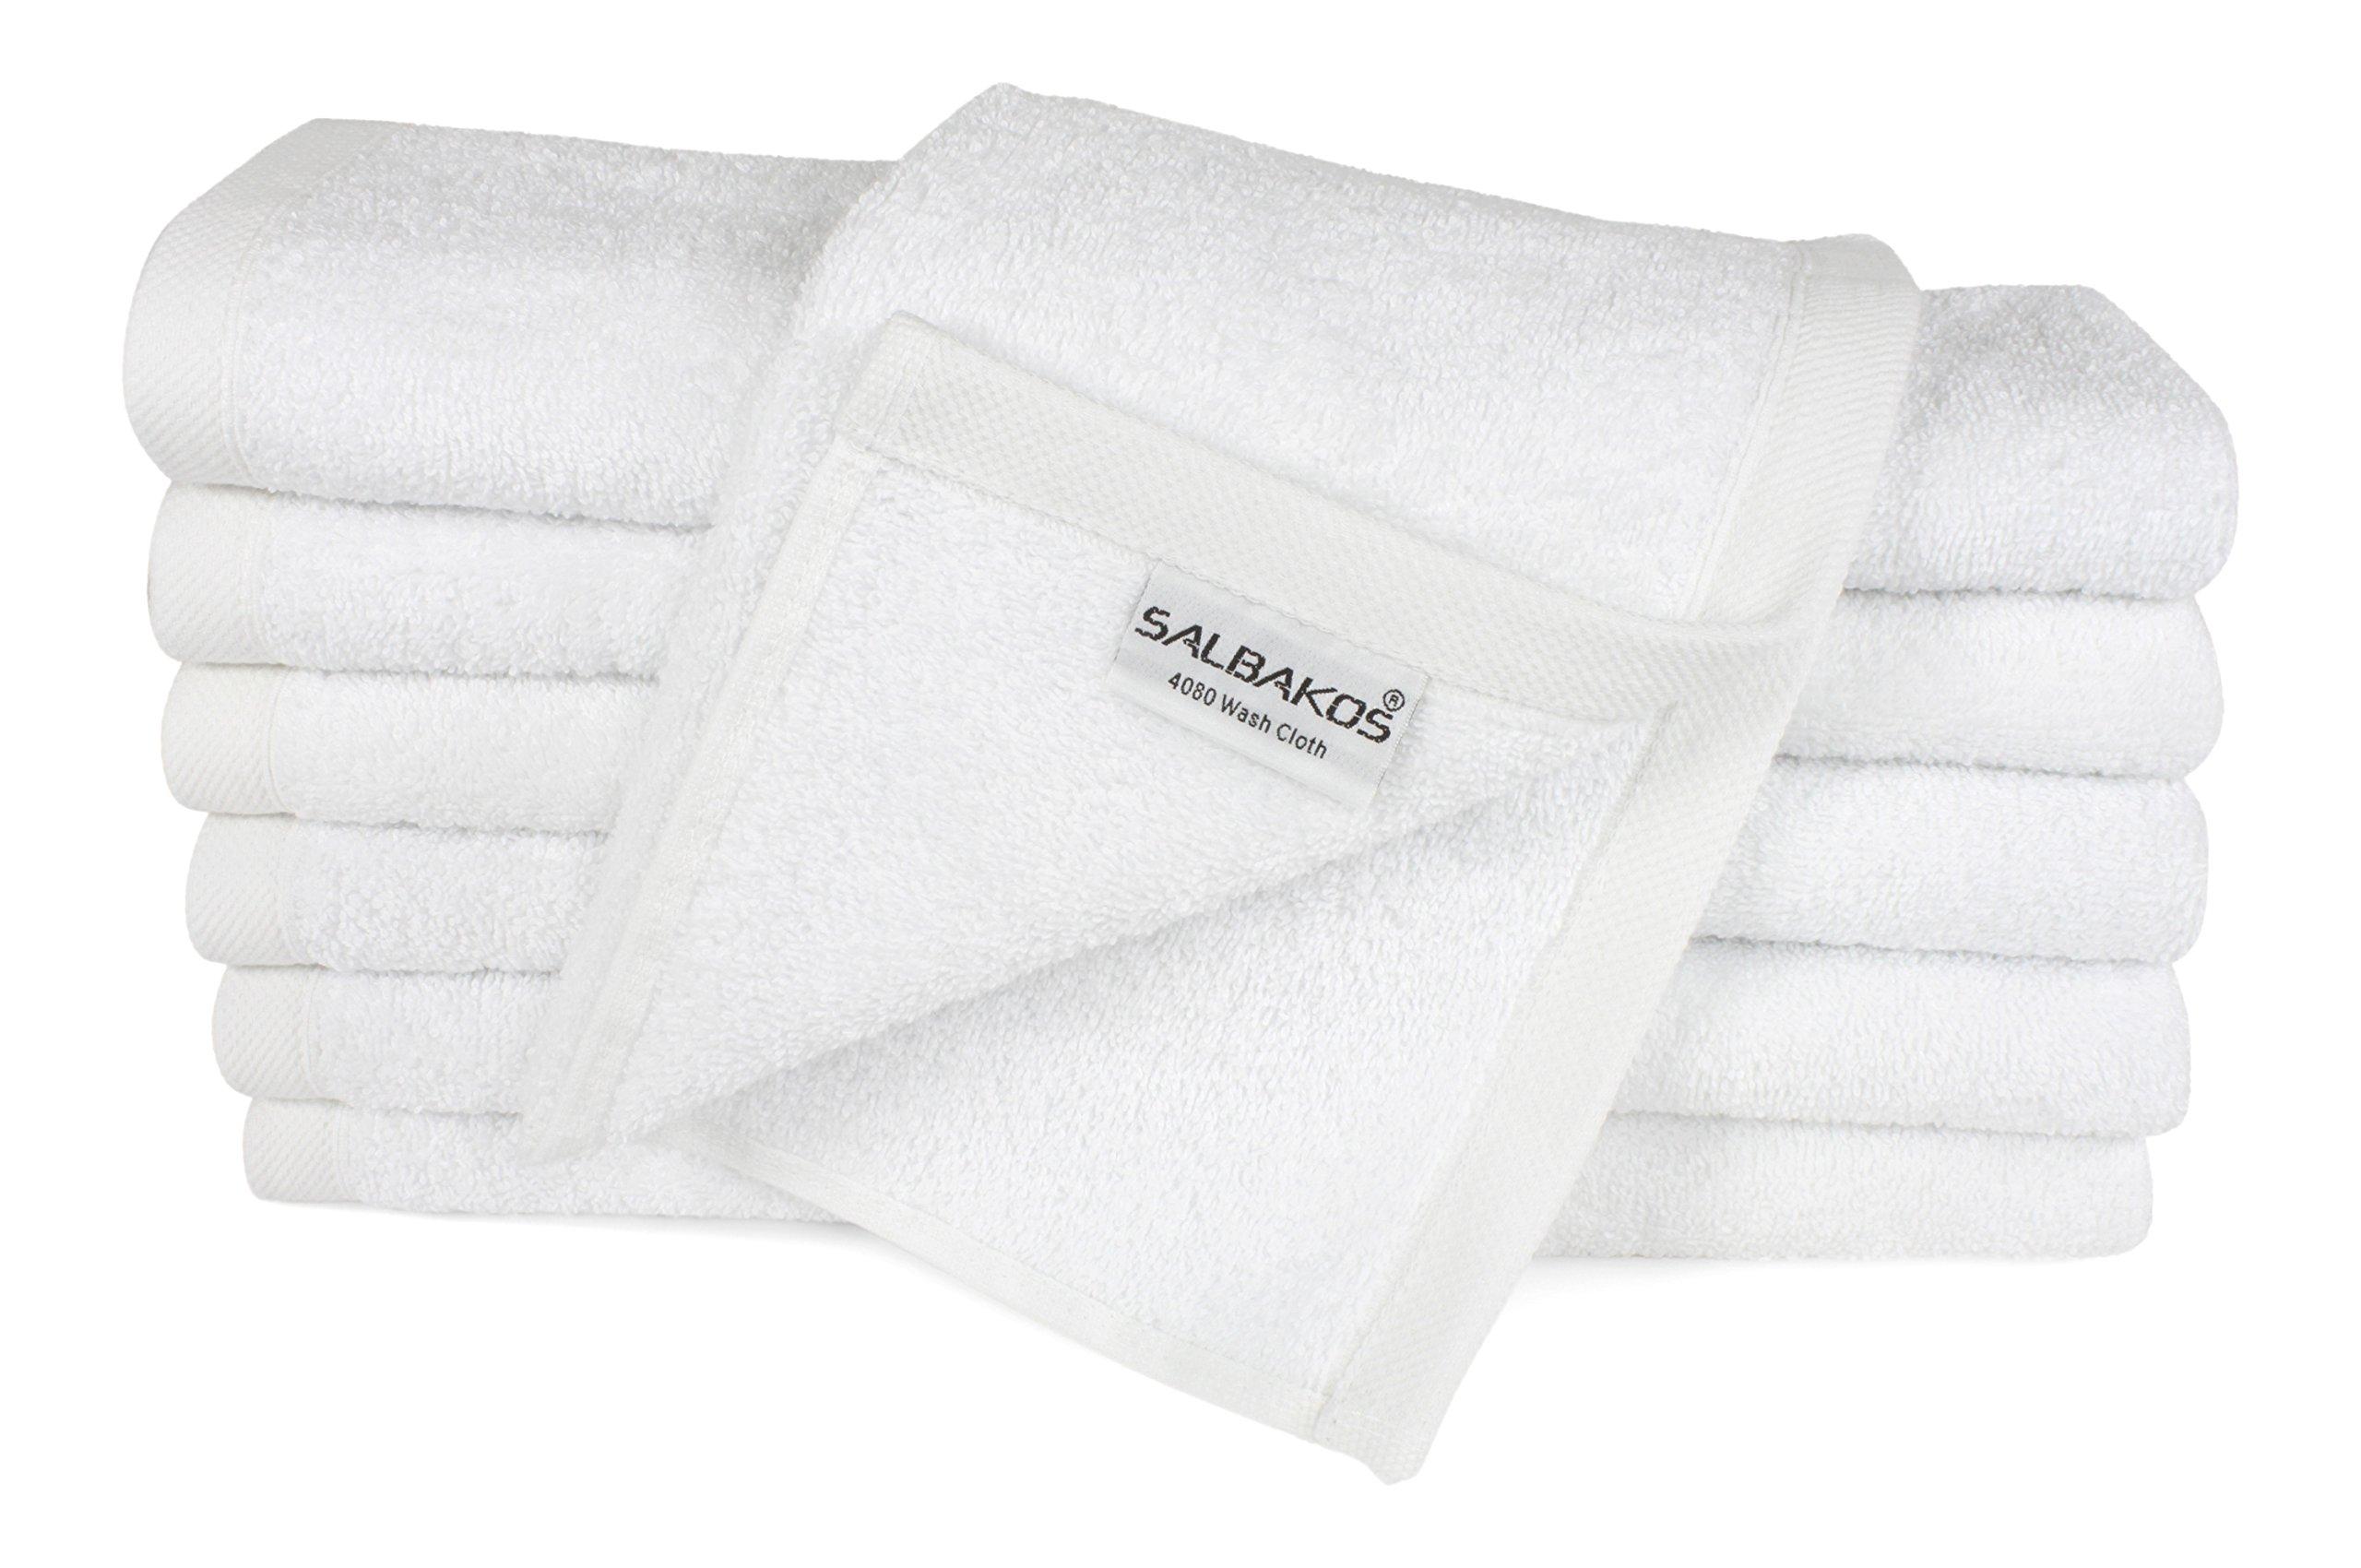 SALBAKOS Luxury Hotel & Spa Turkish Cotton 12-Piece Eco-Friendly Washcloth Set Bath, White